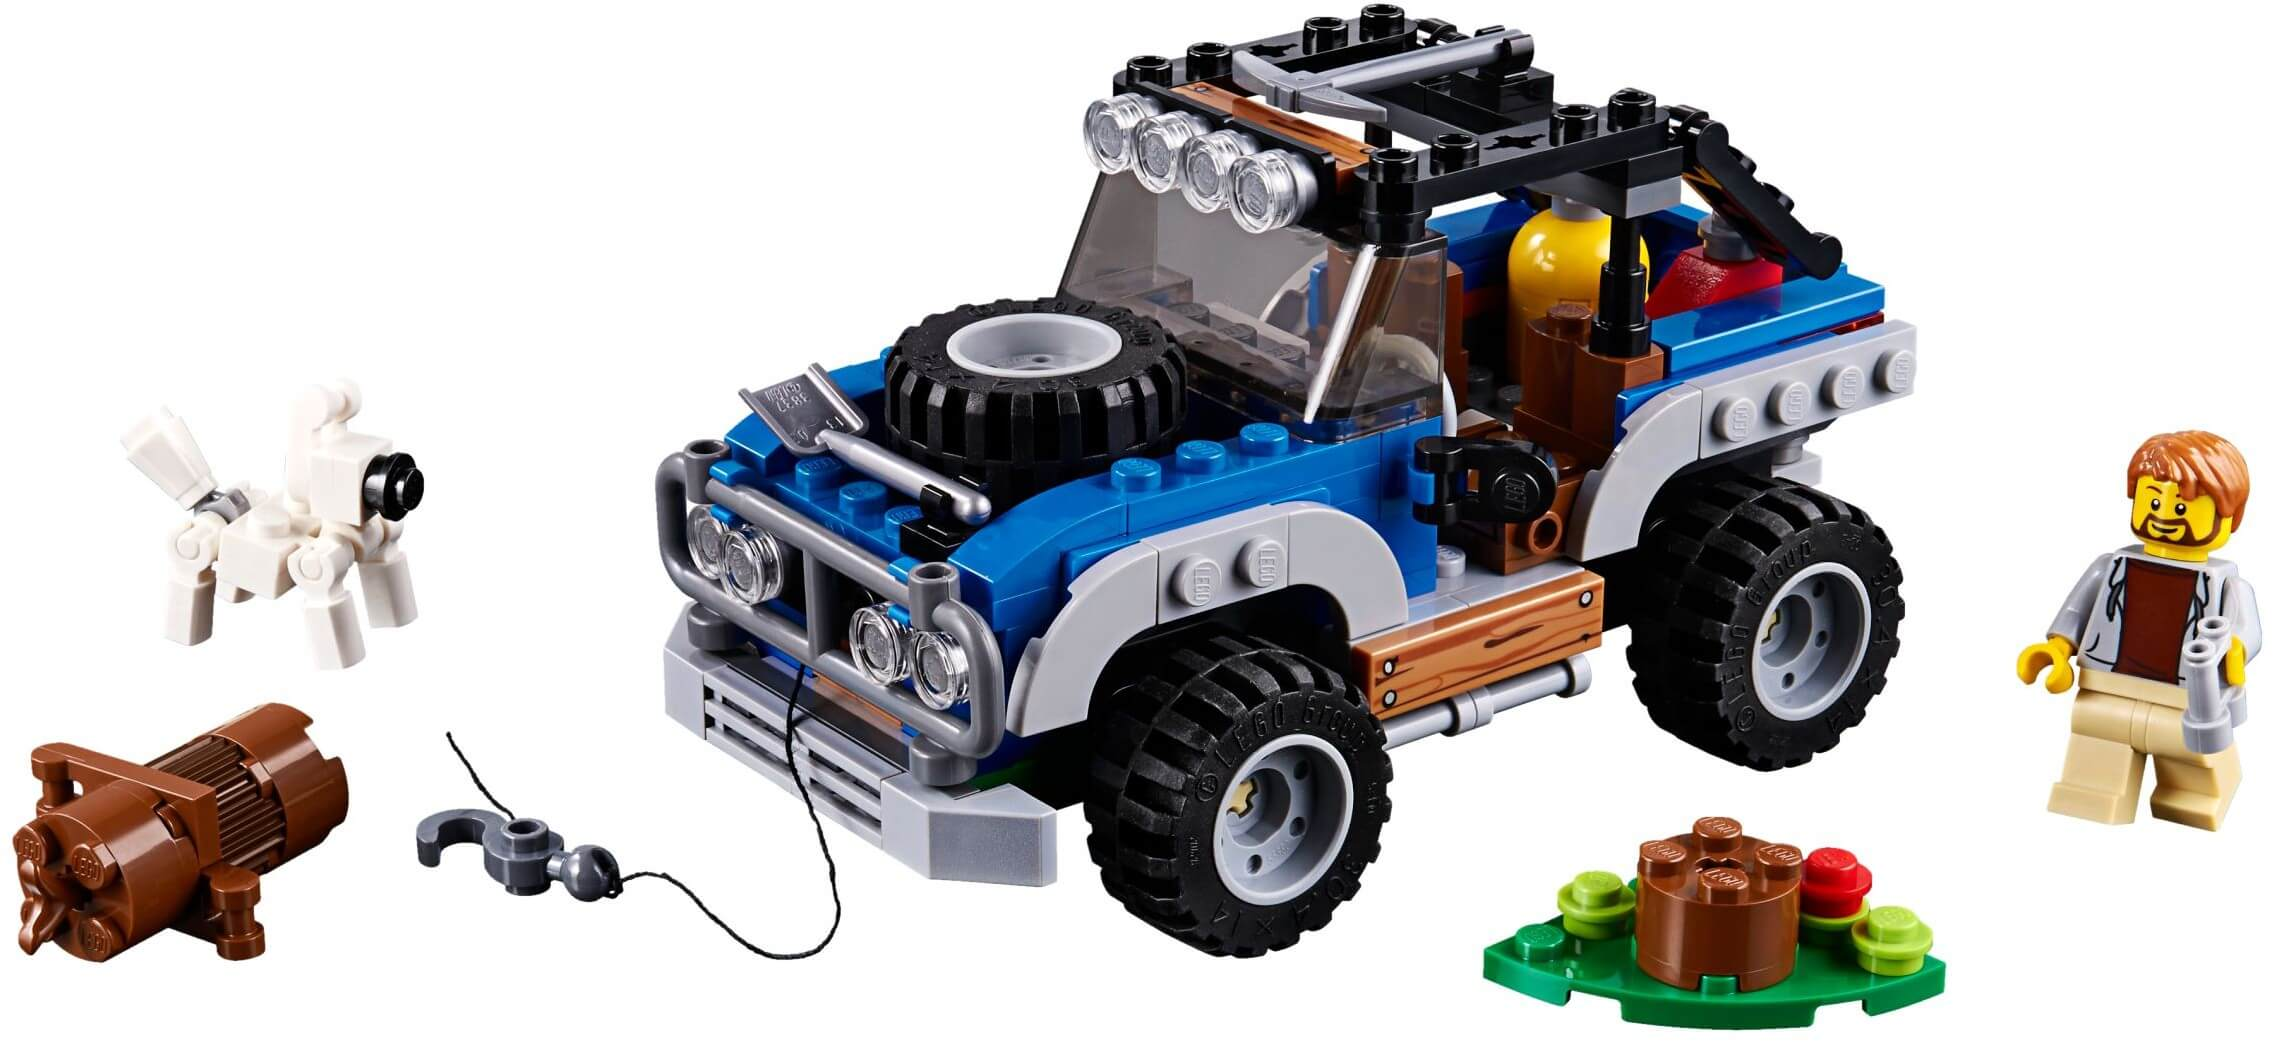 Mua đồ chơi LEGO 31075 - LEGO Creator 31075 - Xếp hình Xe Jeep - Máy Bay - Thuyền 3-trong-1 (LEGO Creator 31075 Outback Adventures)